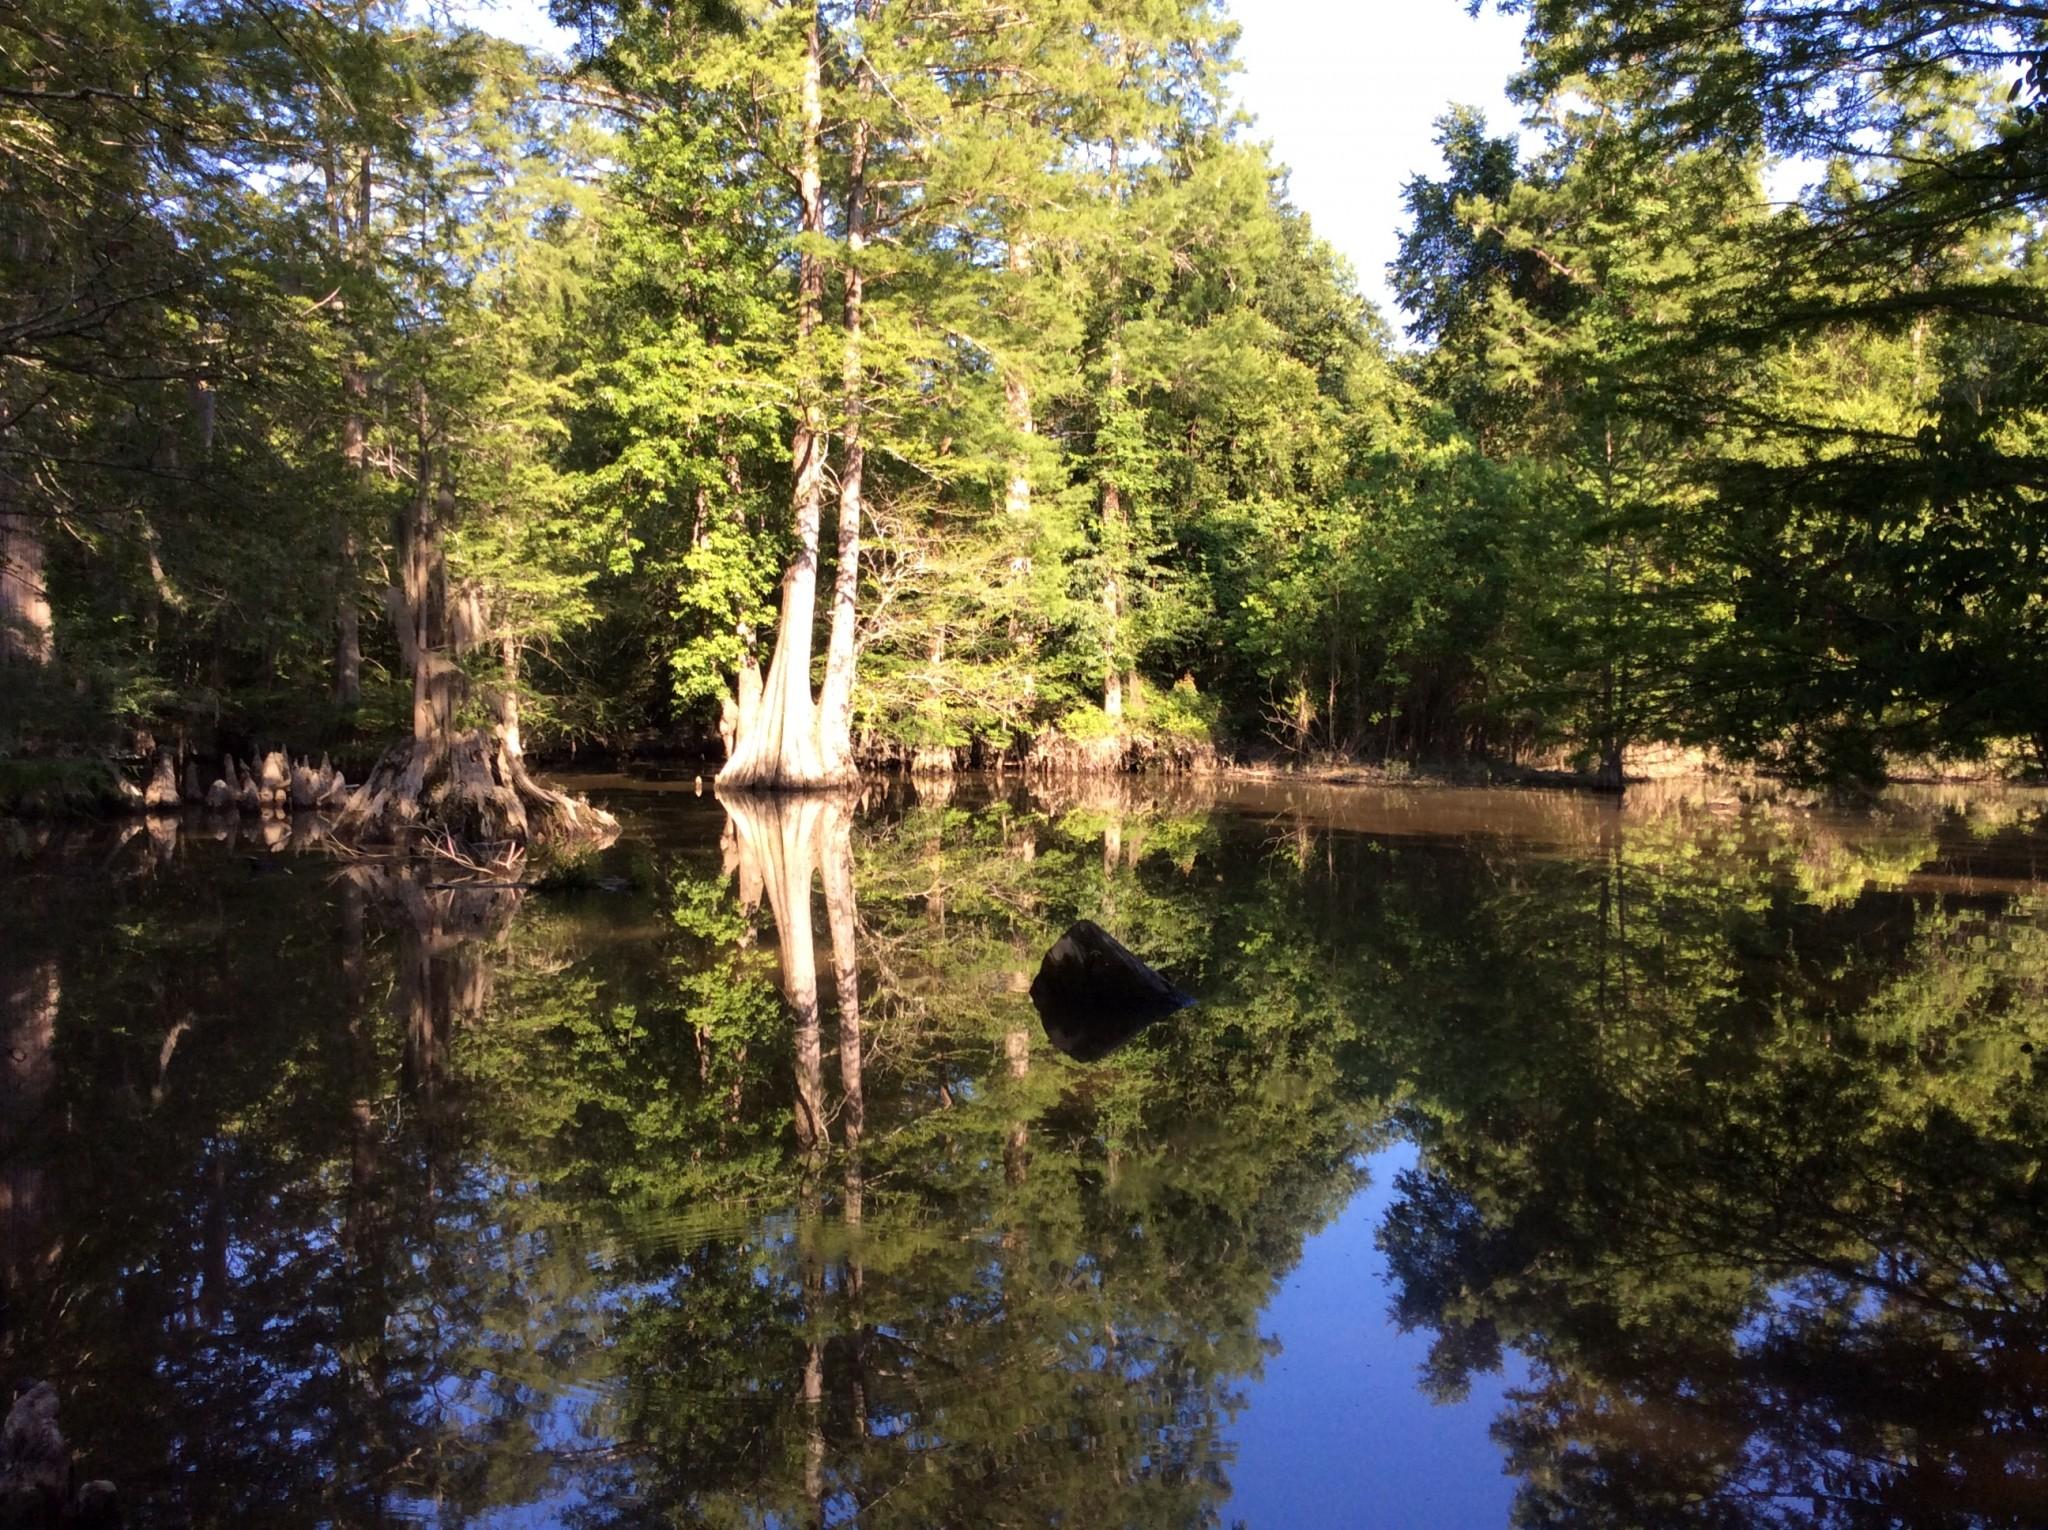 Castor Creek Tract, Caldwell Parish, 350 Acres +/- | Mossy Oak